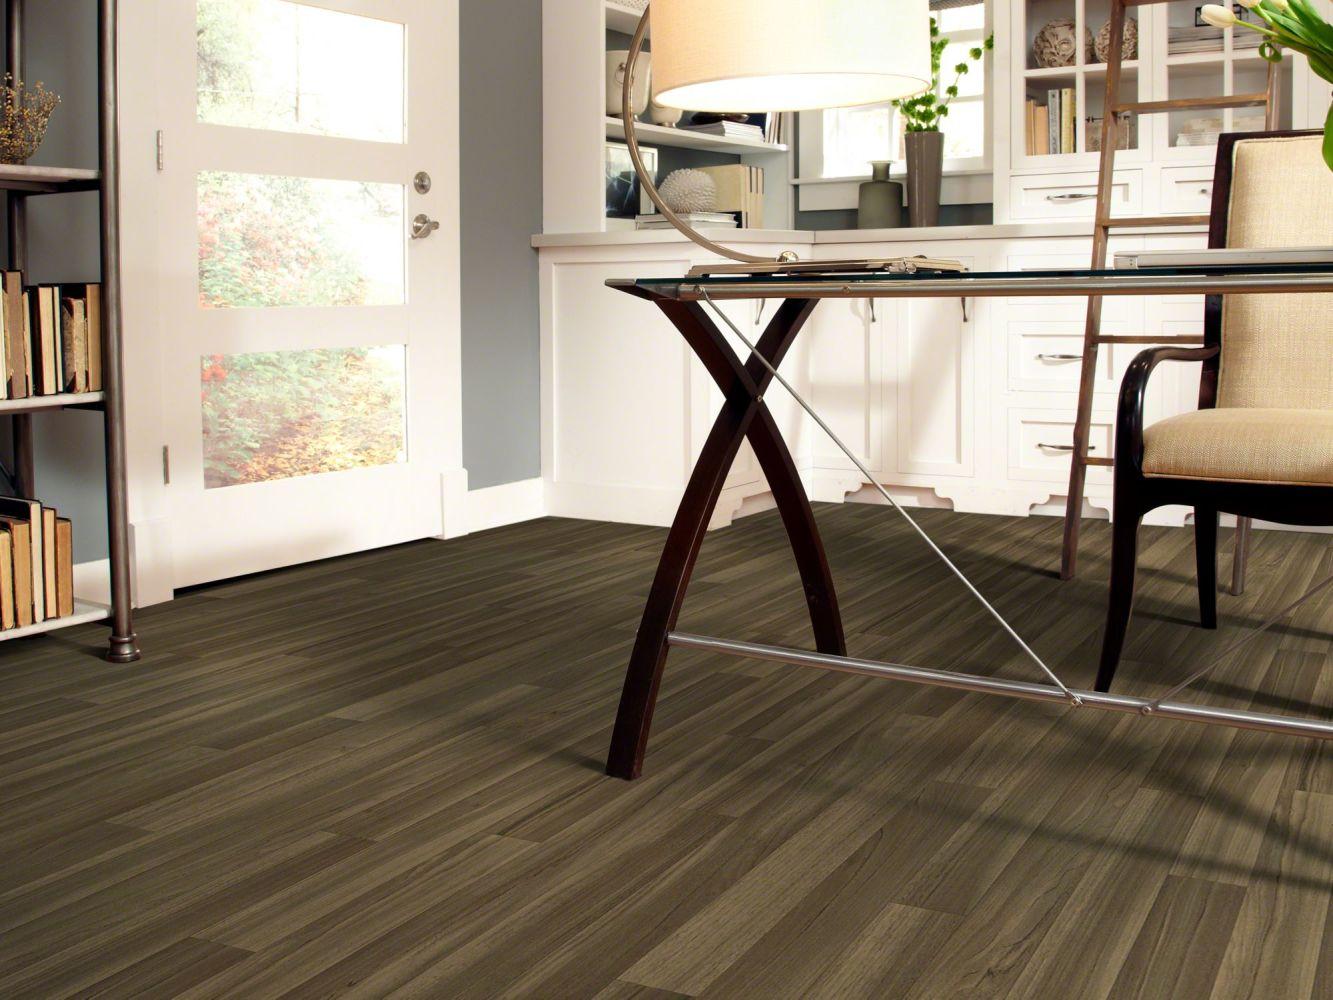 Shaw Floors Resilient Home Foundations Living Quarters Minnesota 00212_VG055